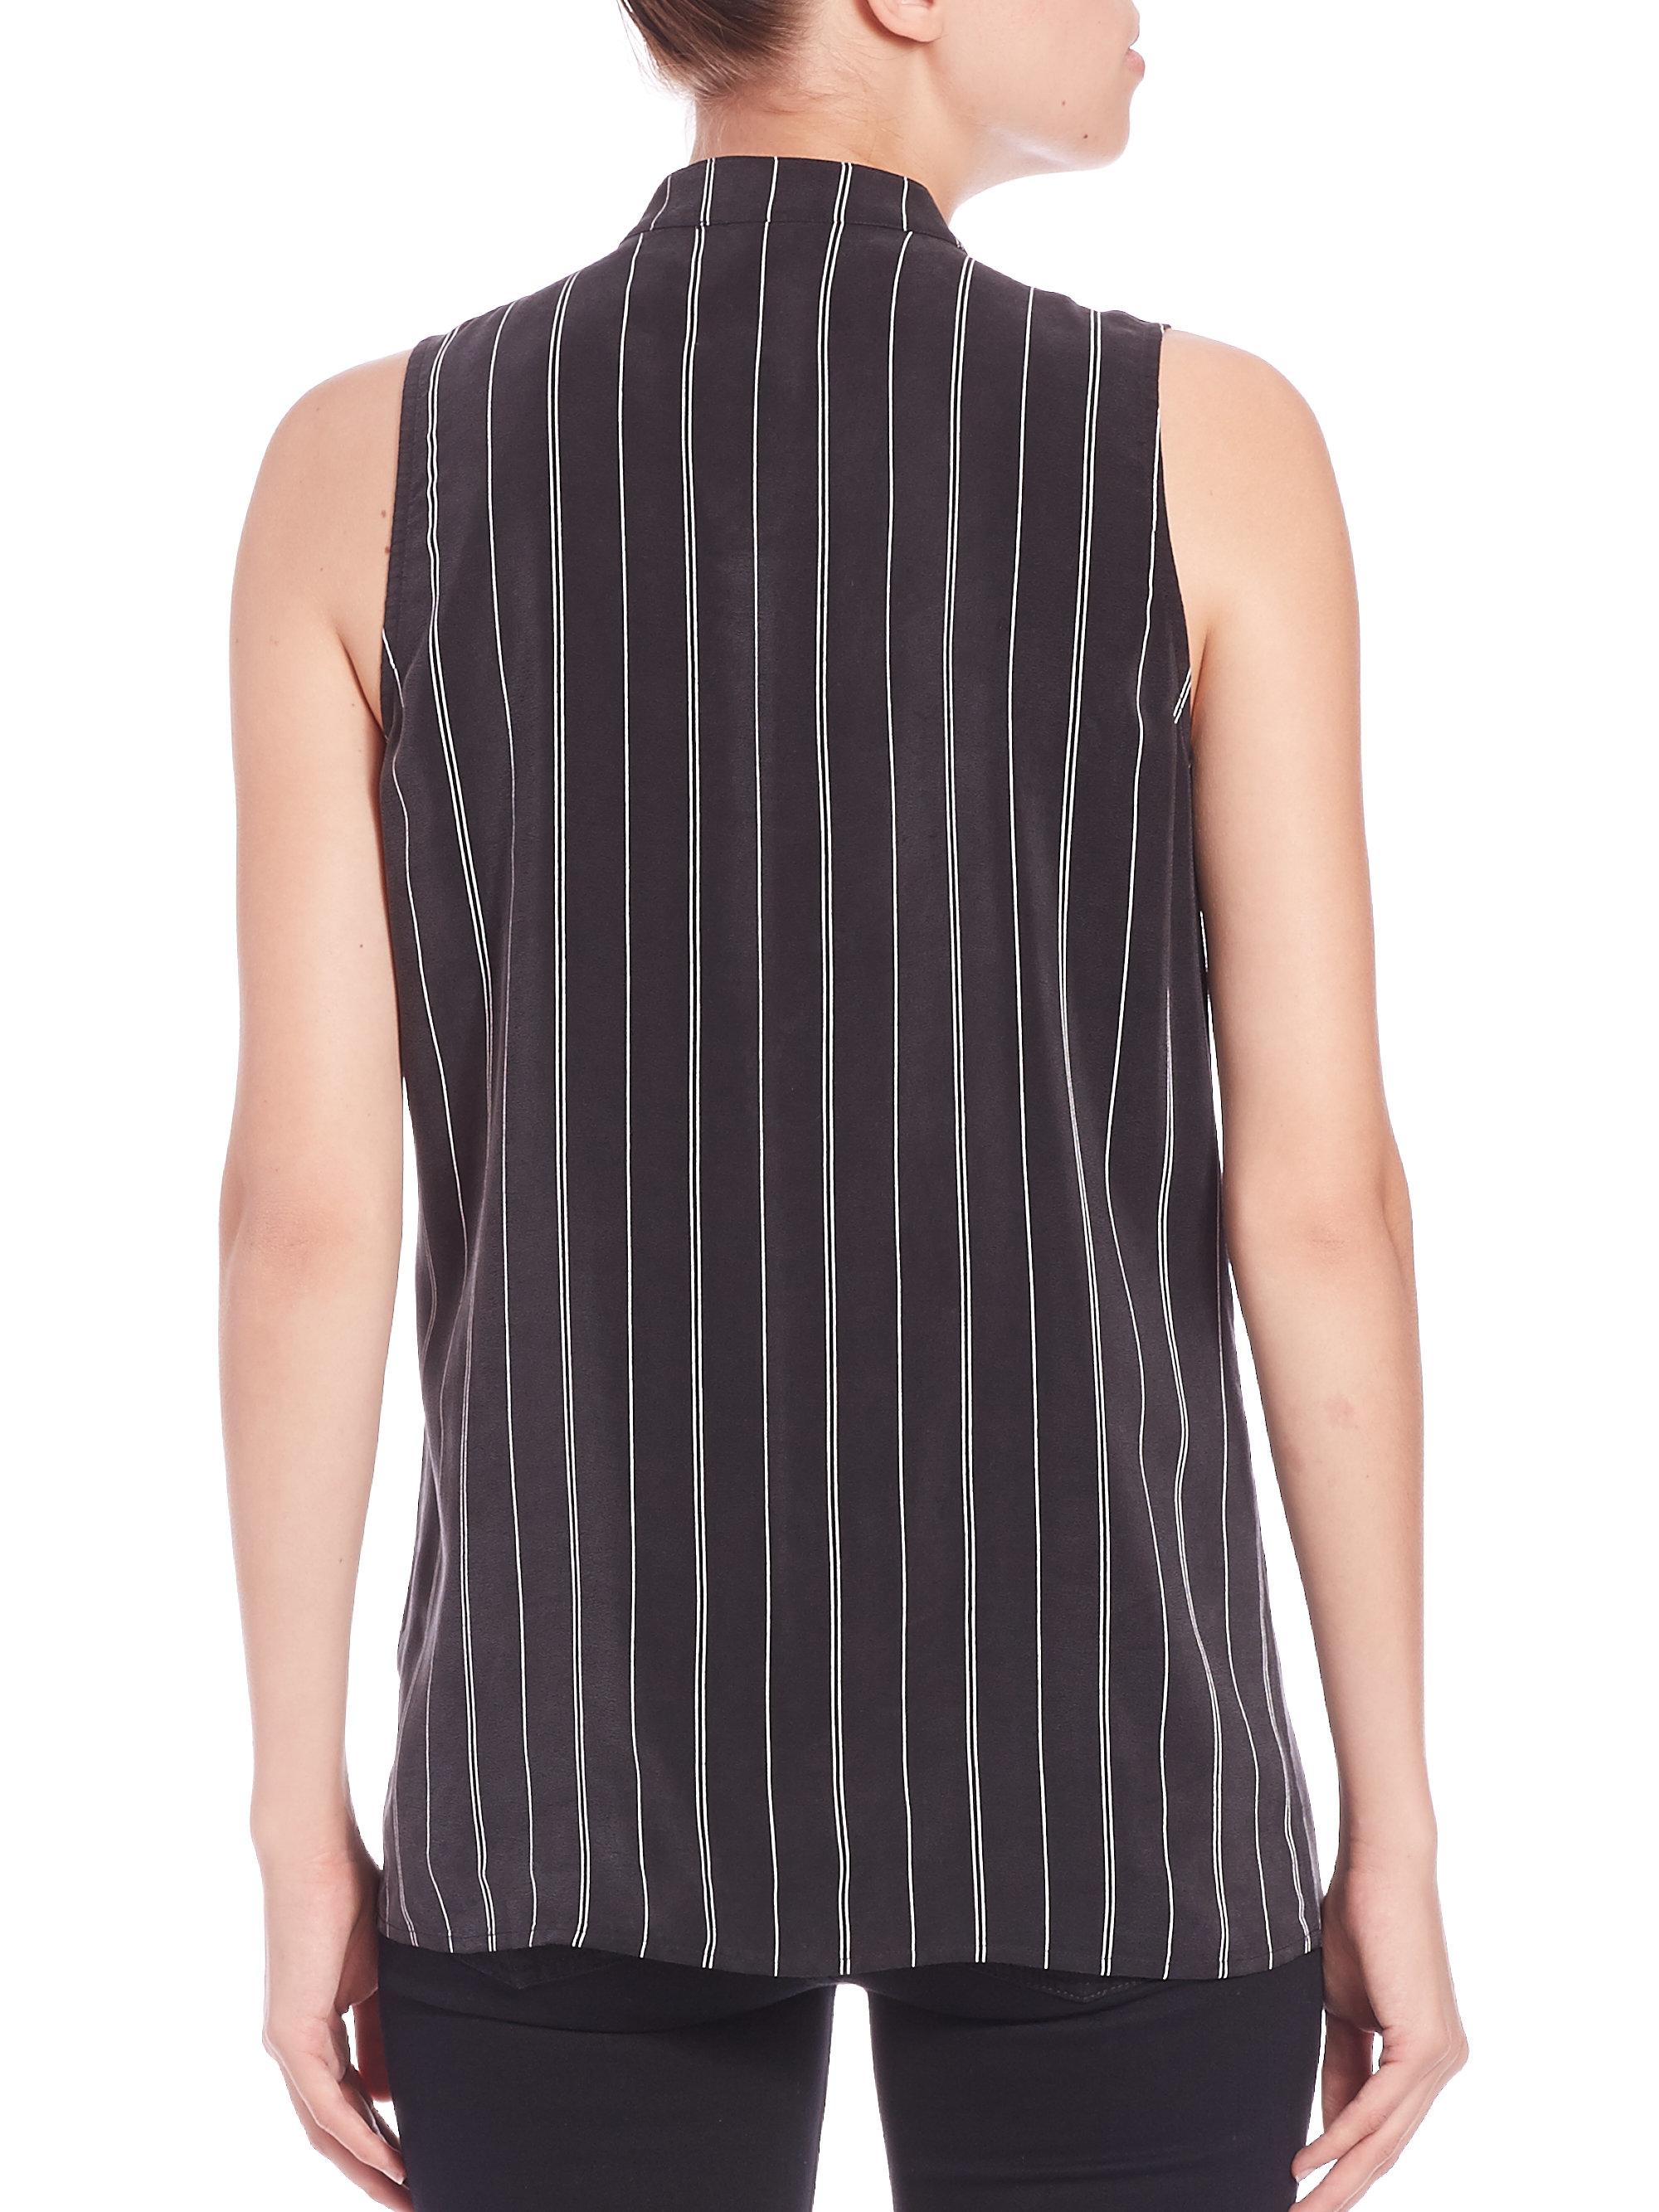 Lyst equipment emmett stripe silk shirt in black for Equipment black silk shirt